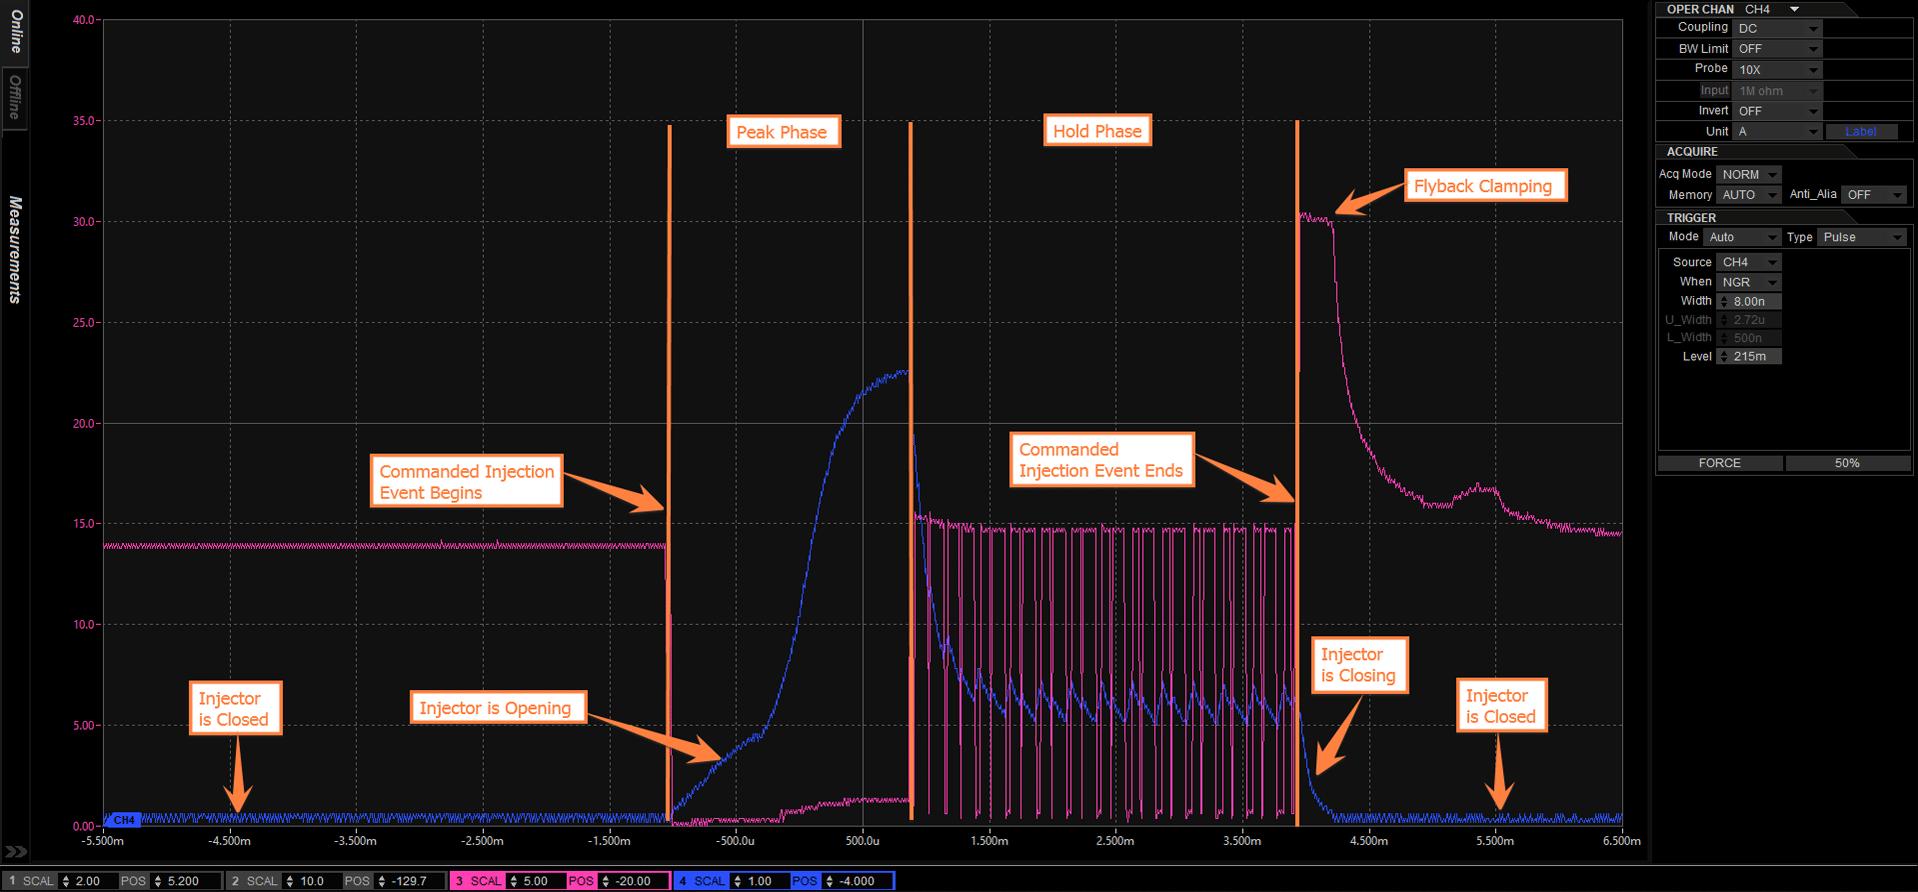 MS3Pro Ultimate Peak & Hold Scope Trace